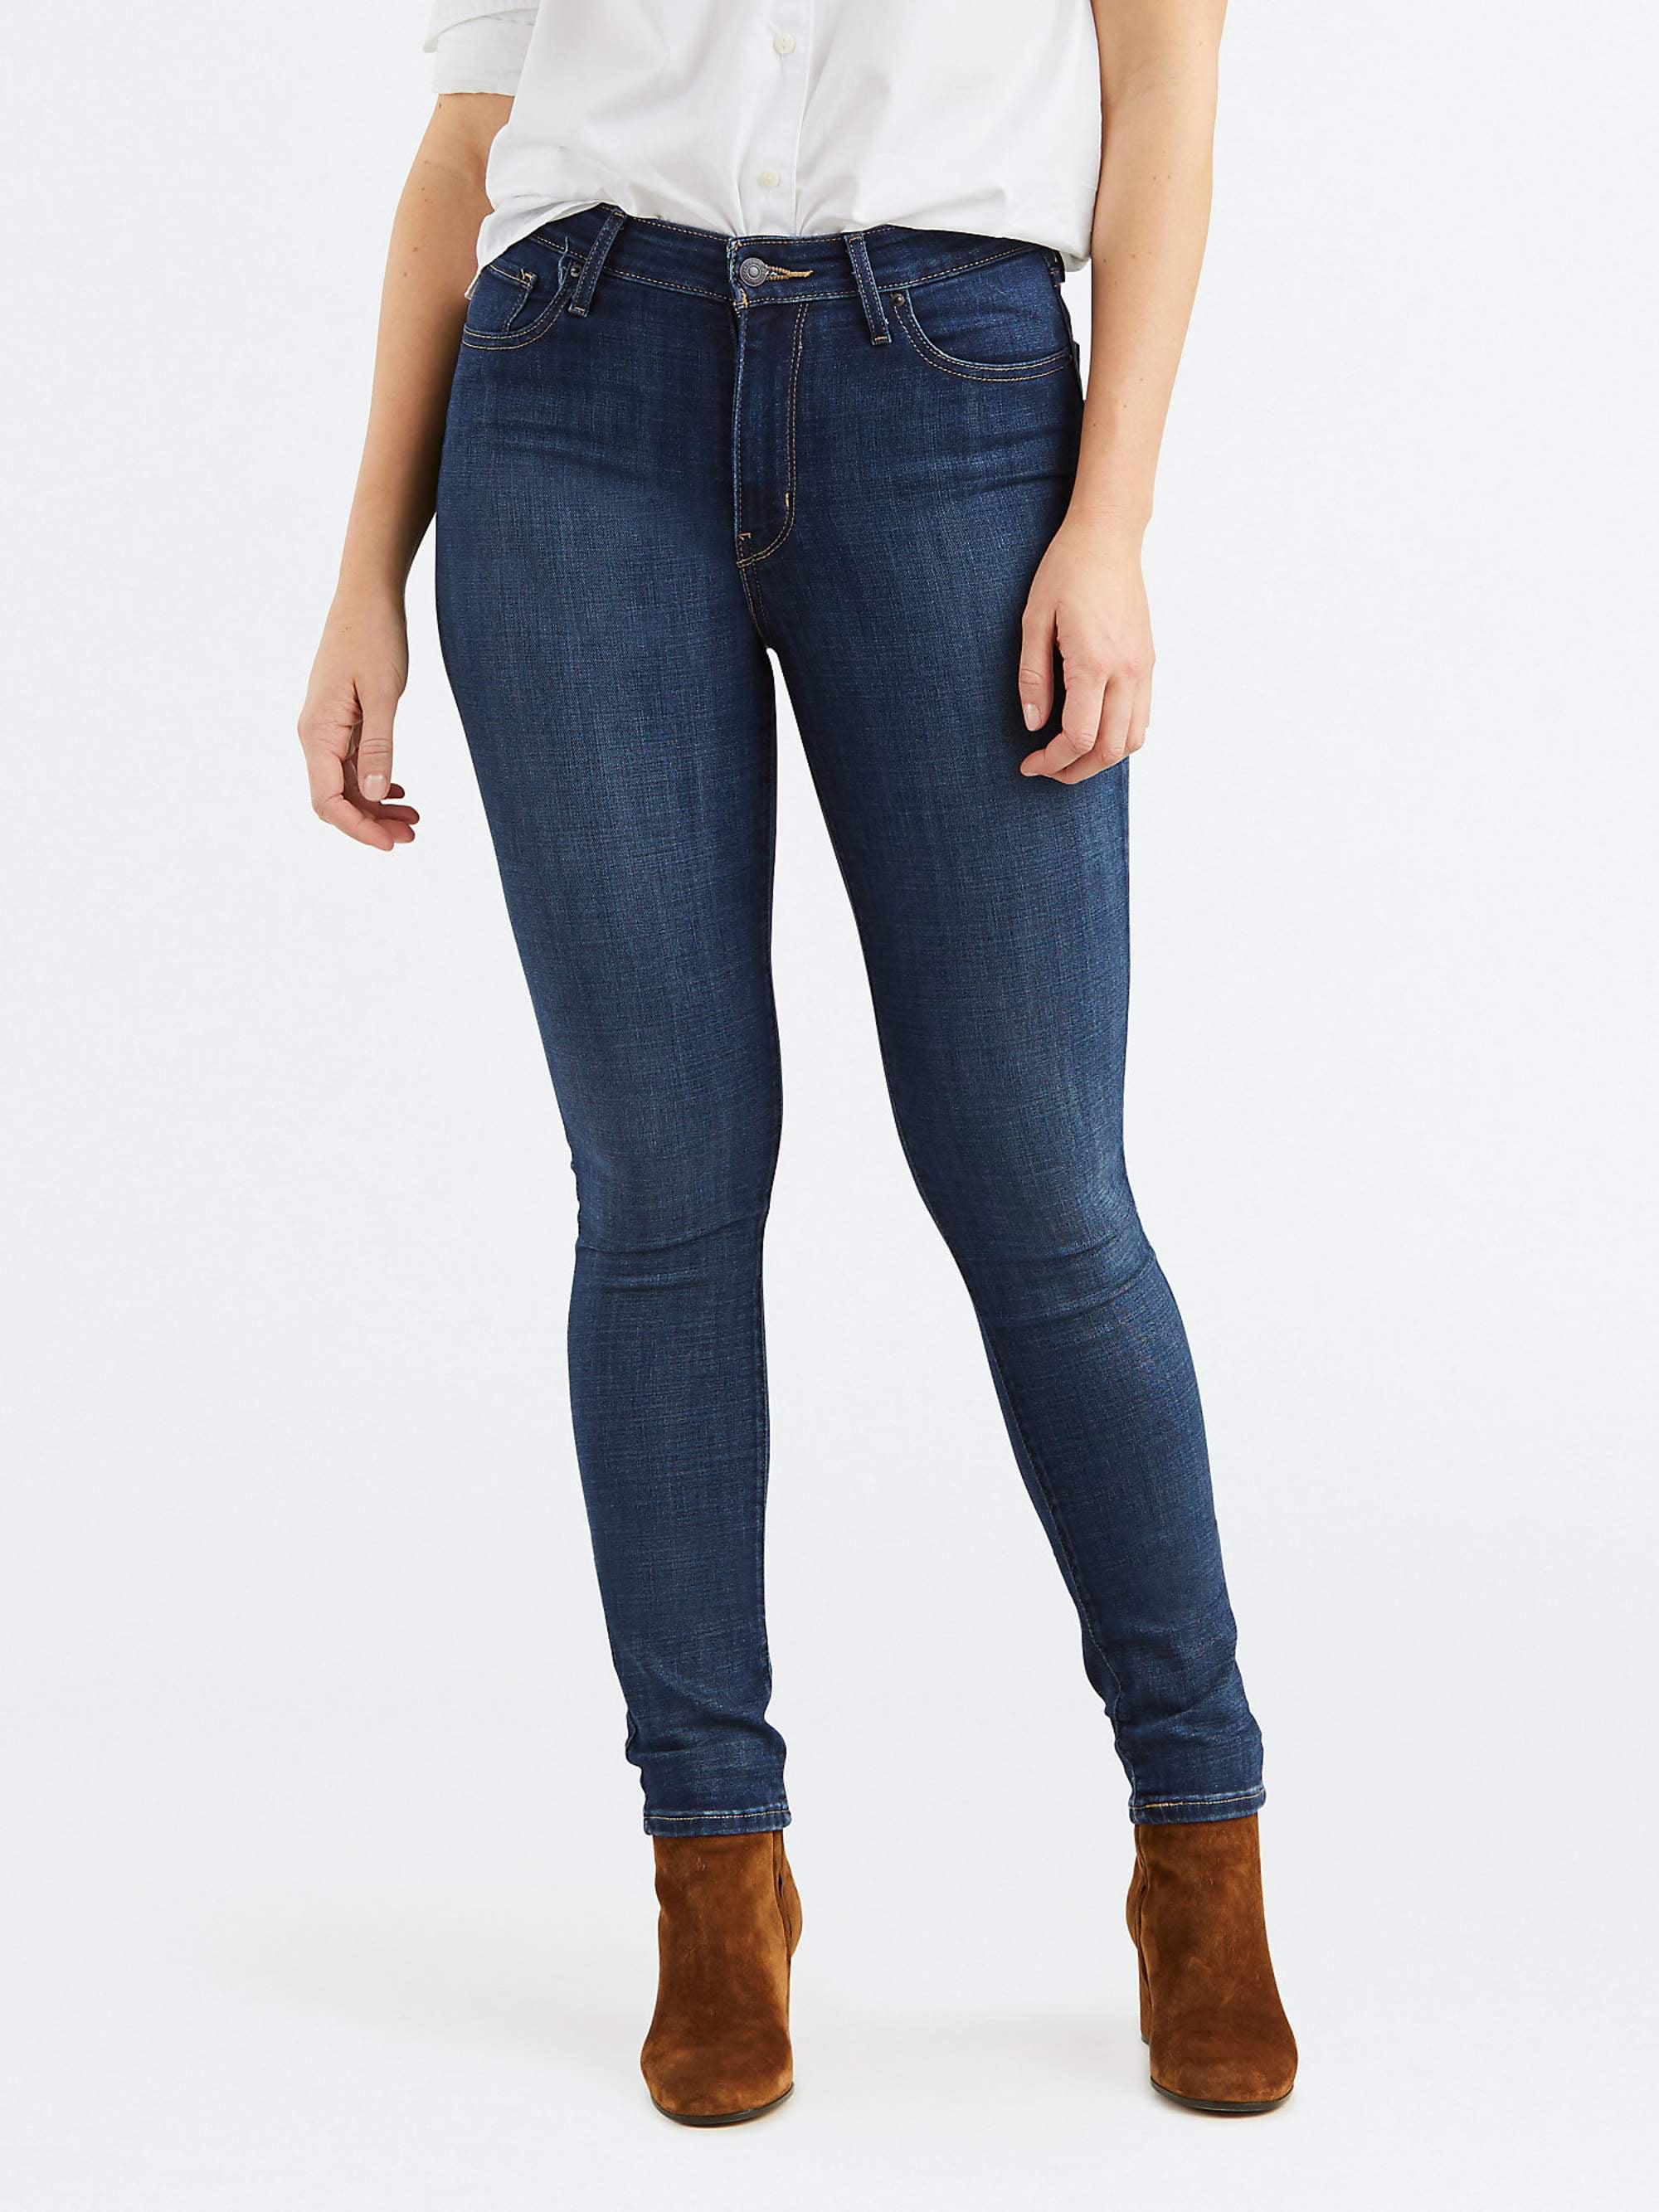 e86fb98cd9da Levi's - Levi's Women's 721 High Rise Skinny Jeans - Walmart.com